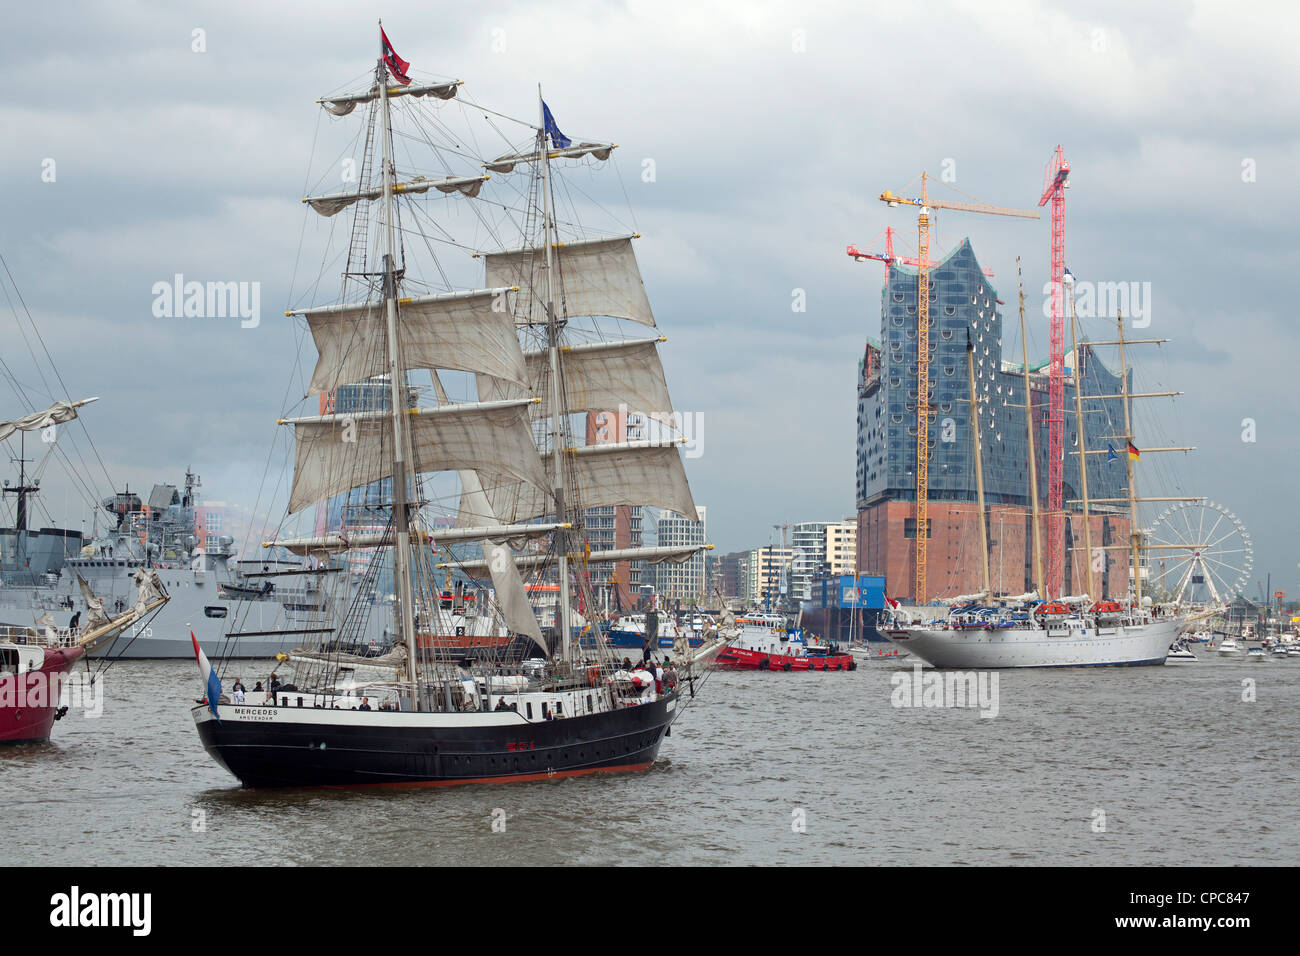 entering port parade, Harbour Birthday, Hamburg, Germany Stock Photo